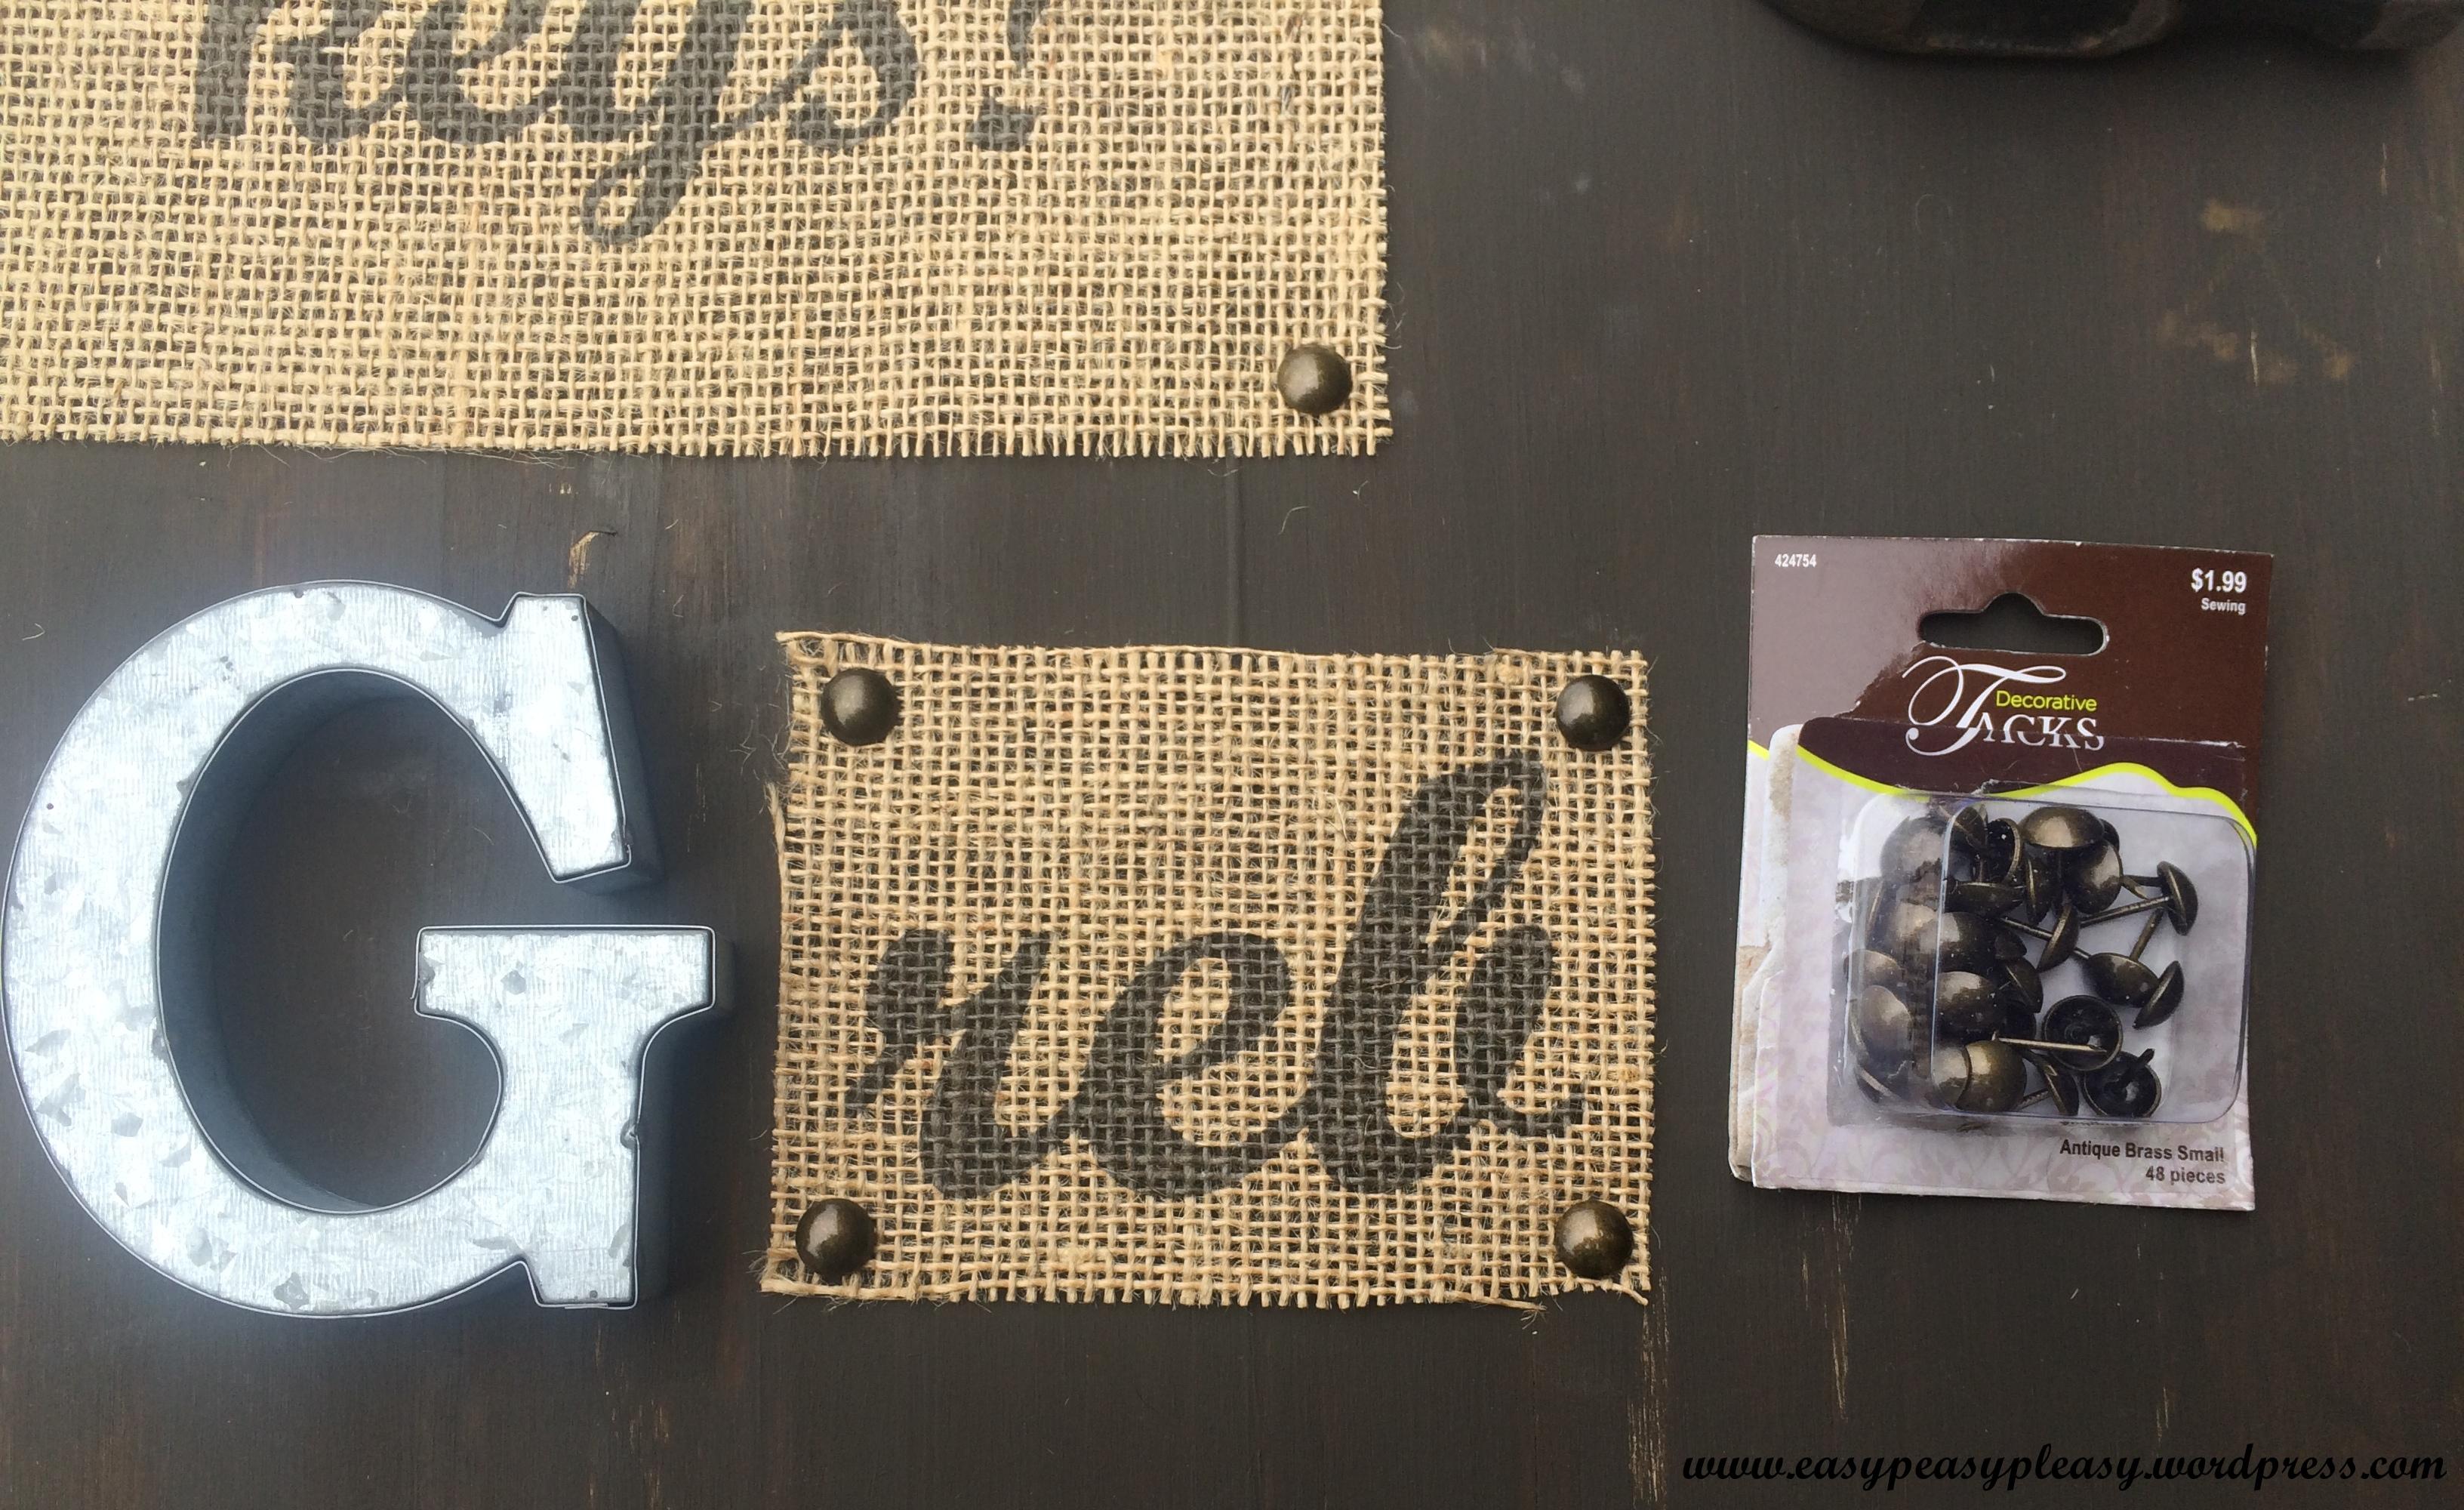 DIY Wedding Gift using Decorative Tacks and Burlap